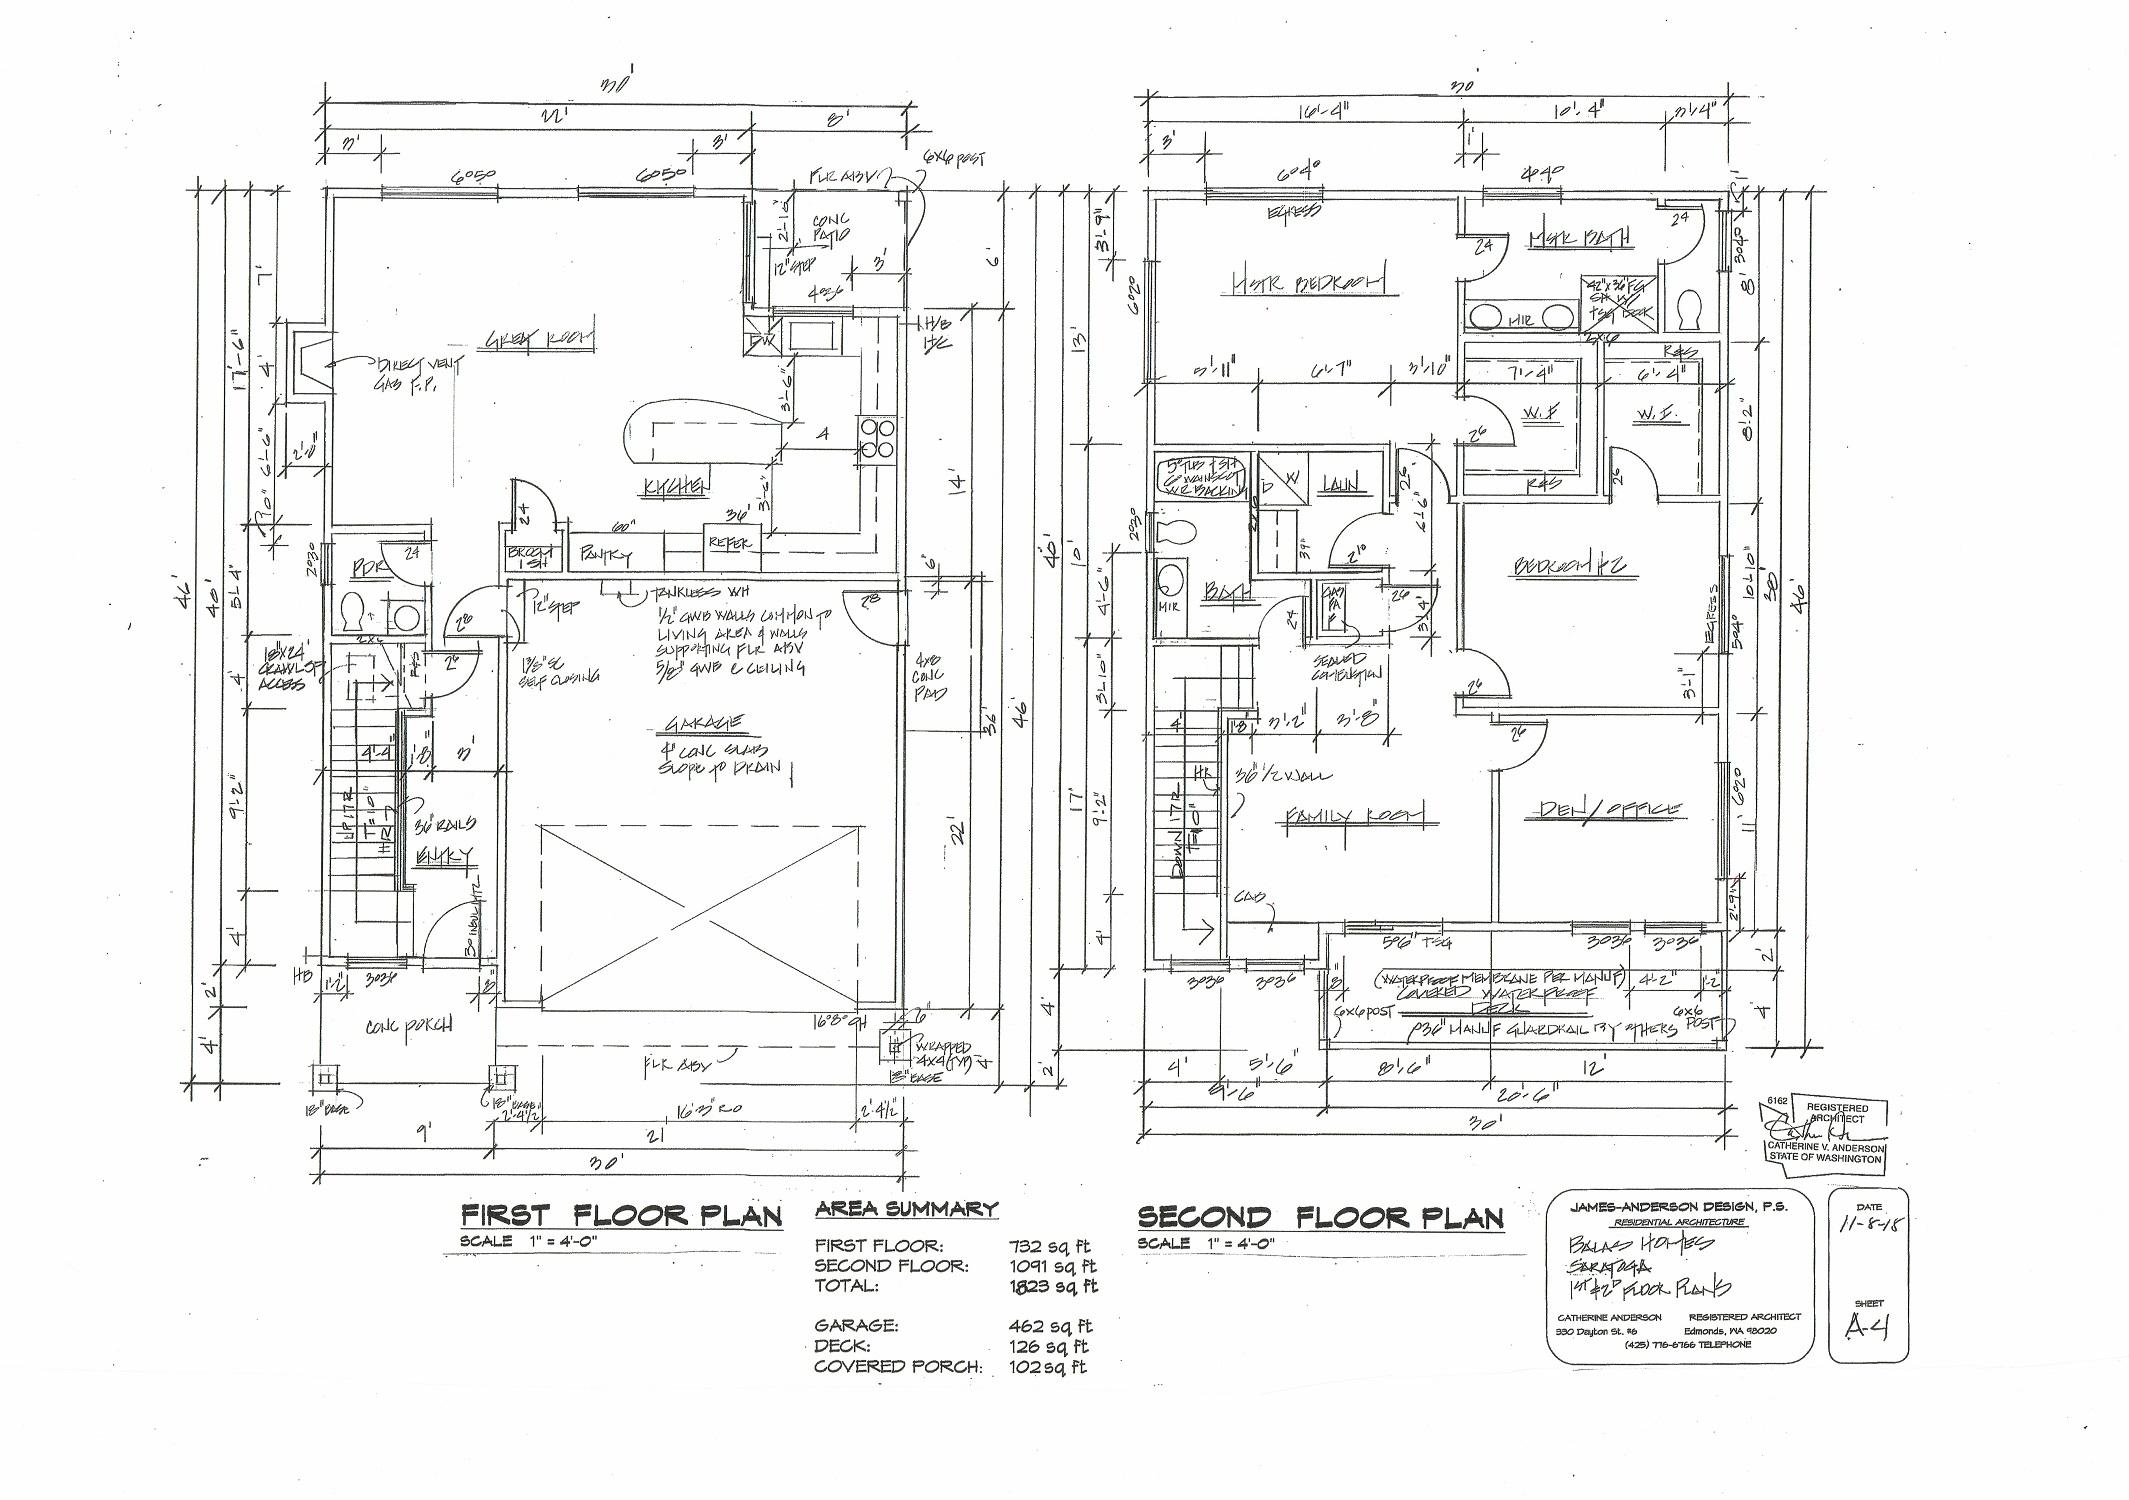 Saratoga floor plan JPG_000002 - Copy.jpg